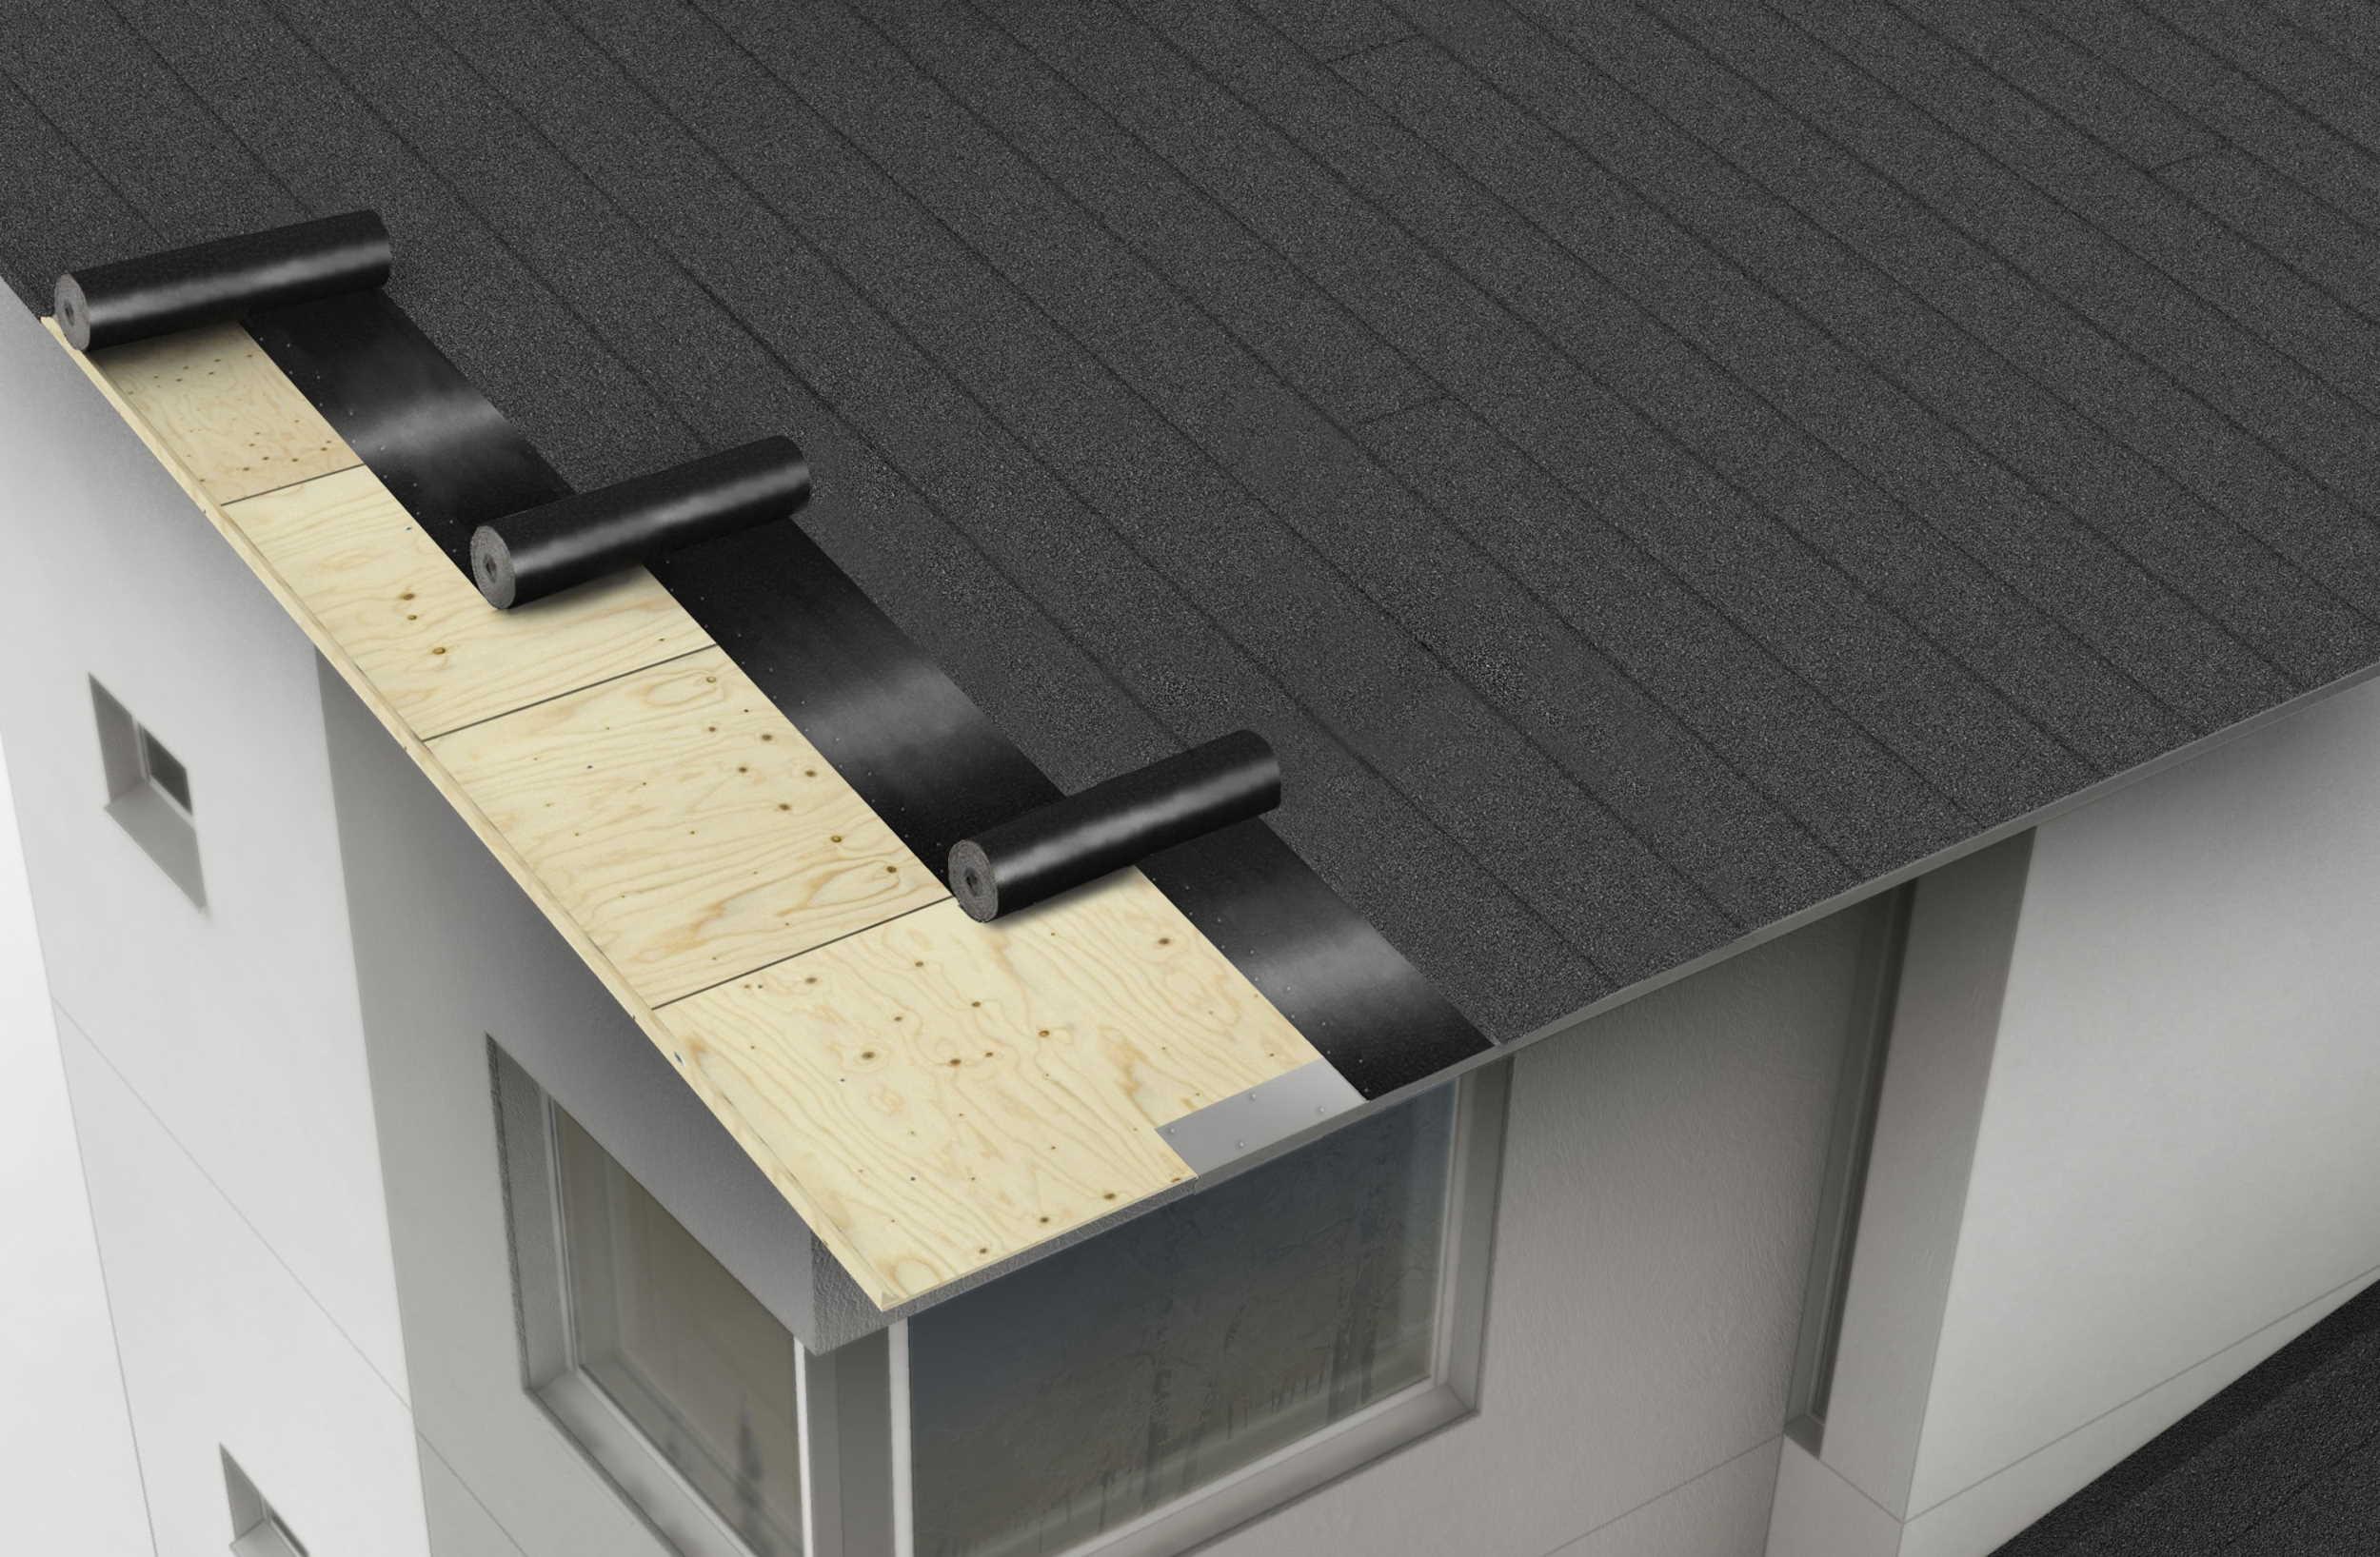 IMG - TopSafe Pro tiivissaumakate kattohuopa 2500x1635